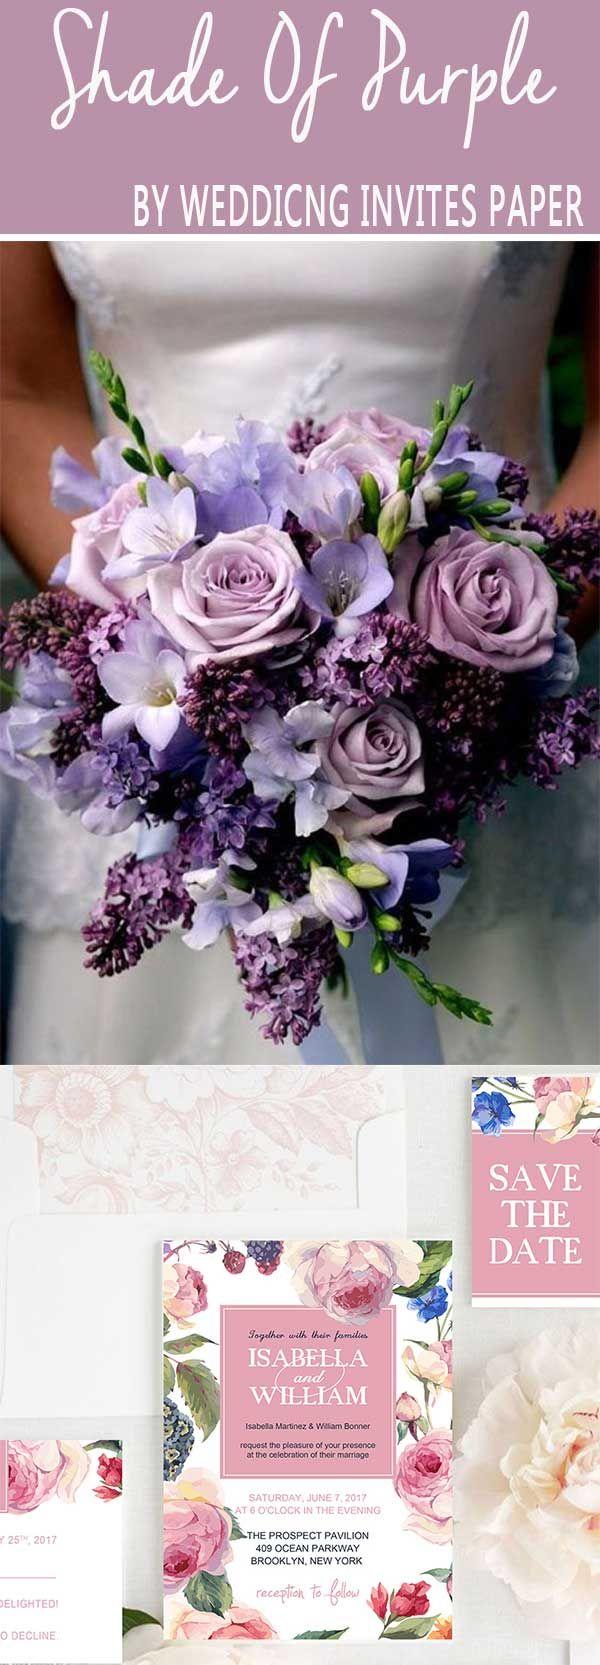 2018 brides favorite weeding color stylish shade of purple 2018 brides favorite weeding color stylish shade of purple wedding invites paper shade of purple wedding bouquet blush pink izmirmasajfo